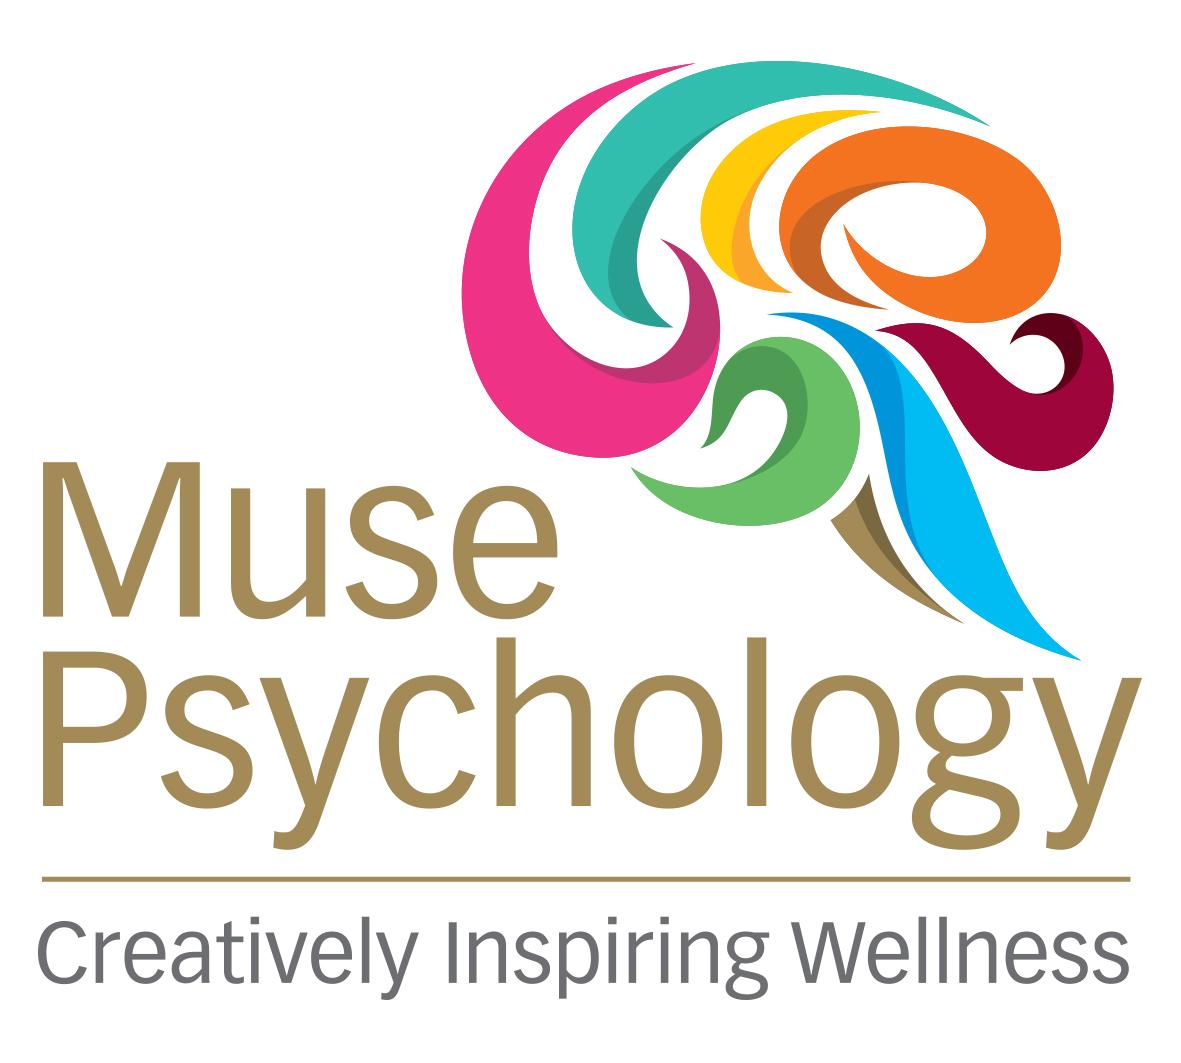 Muse Psychology